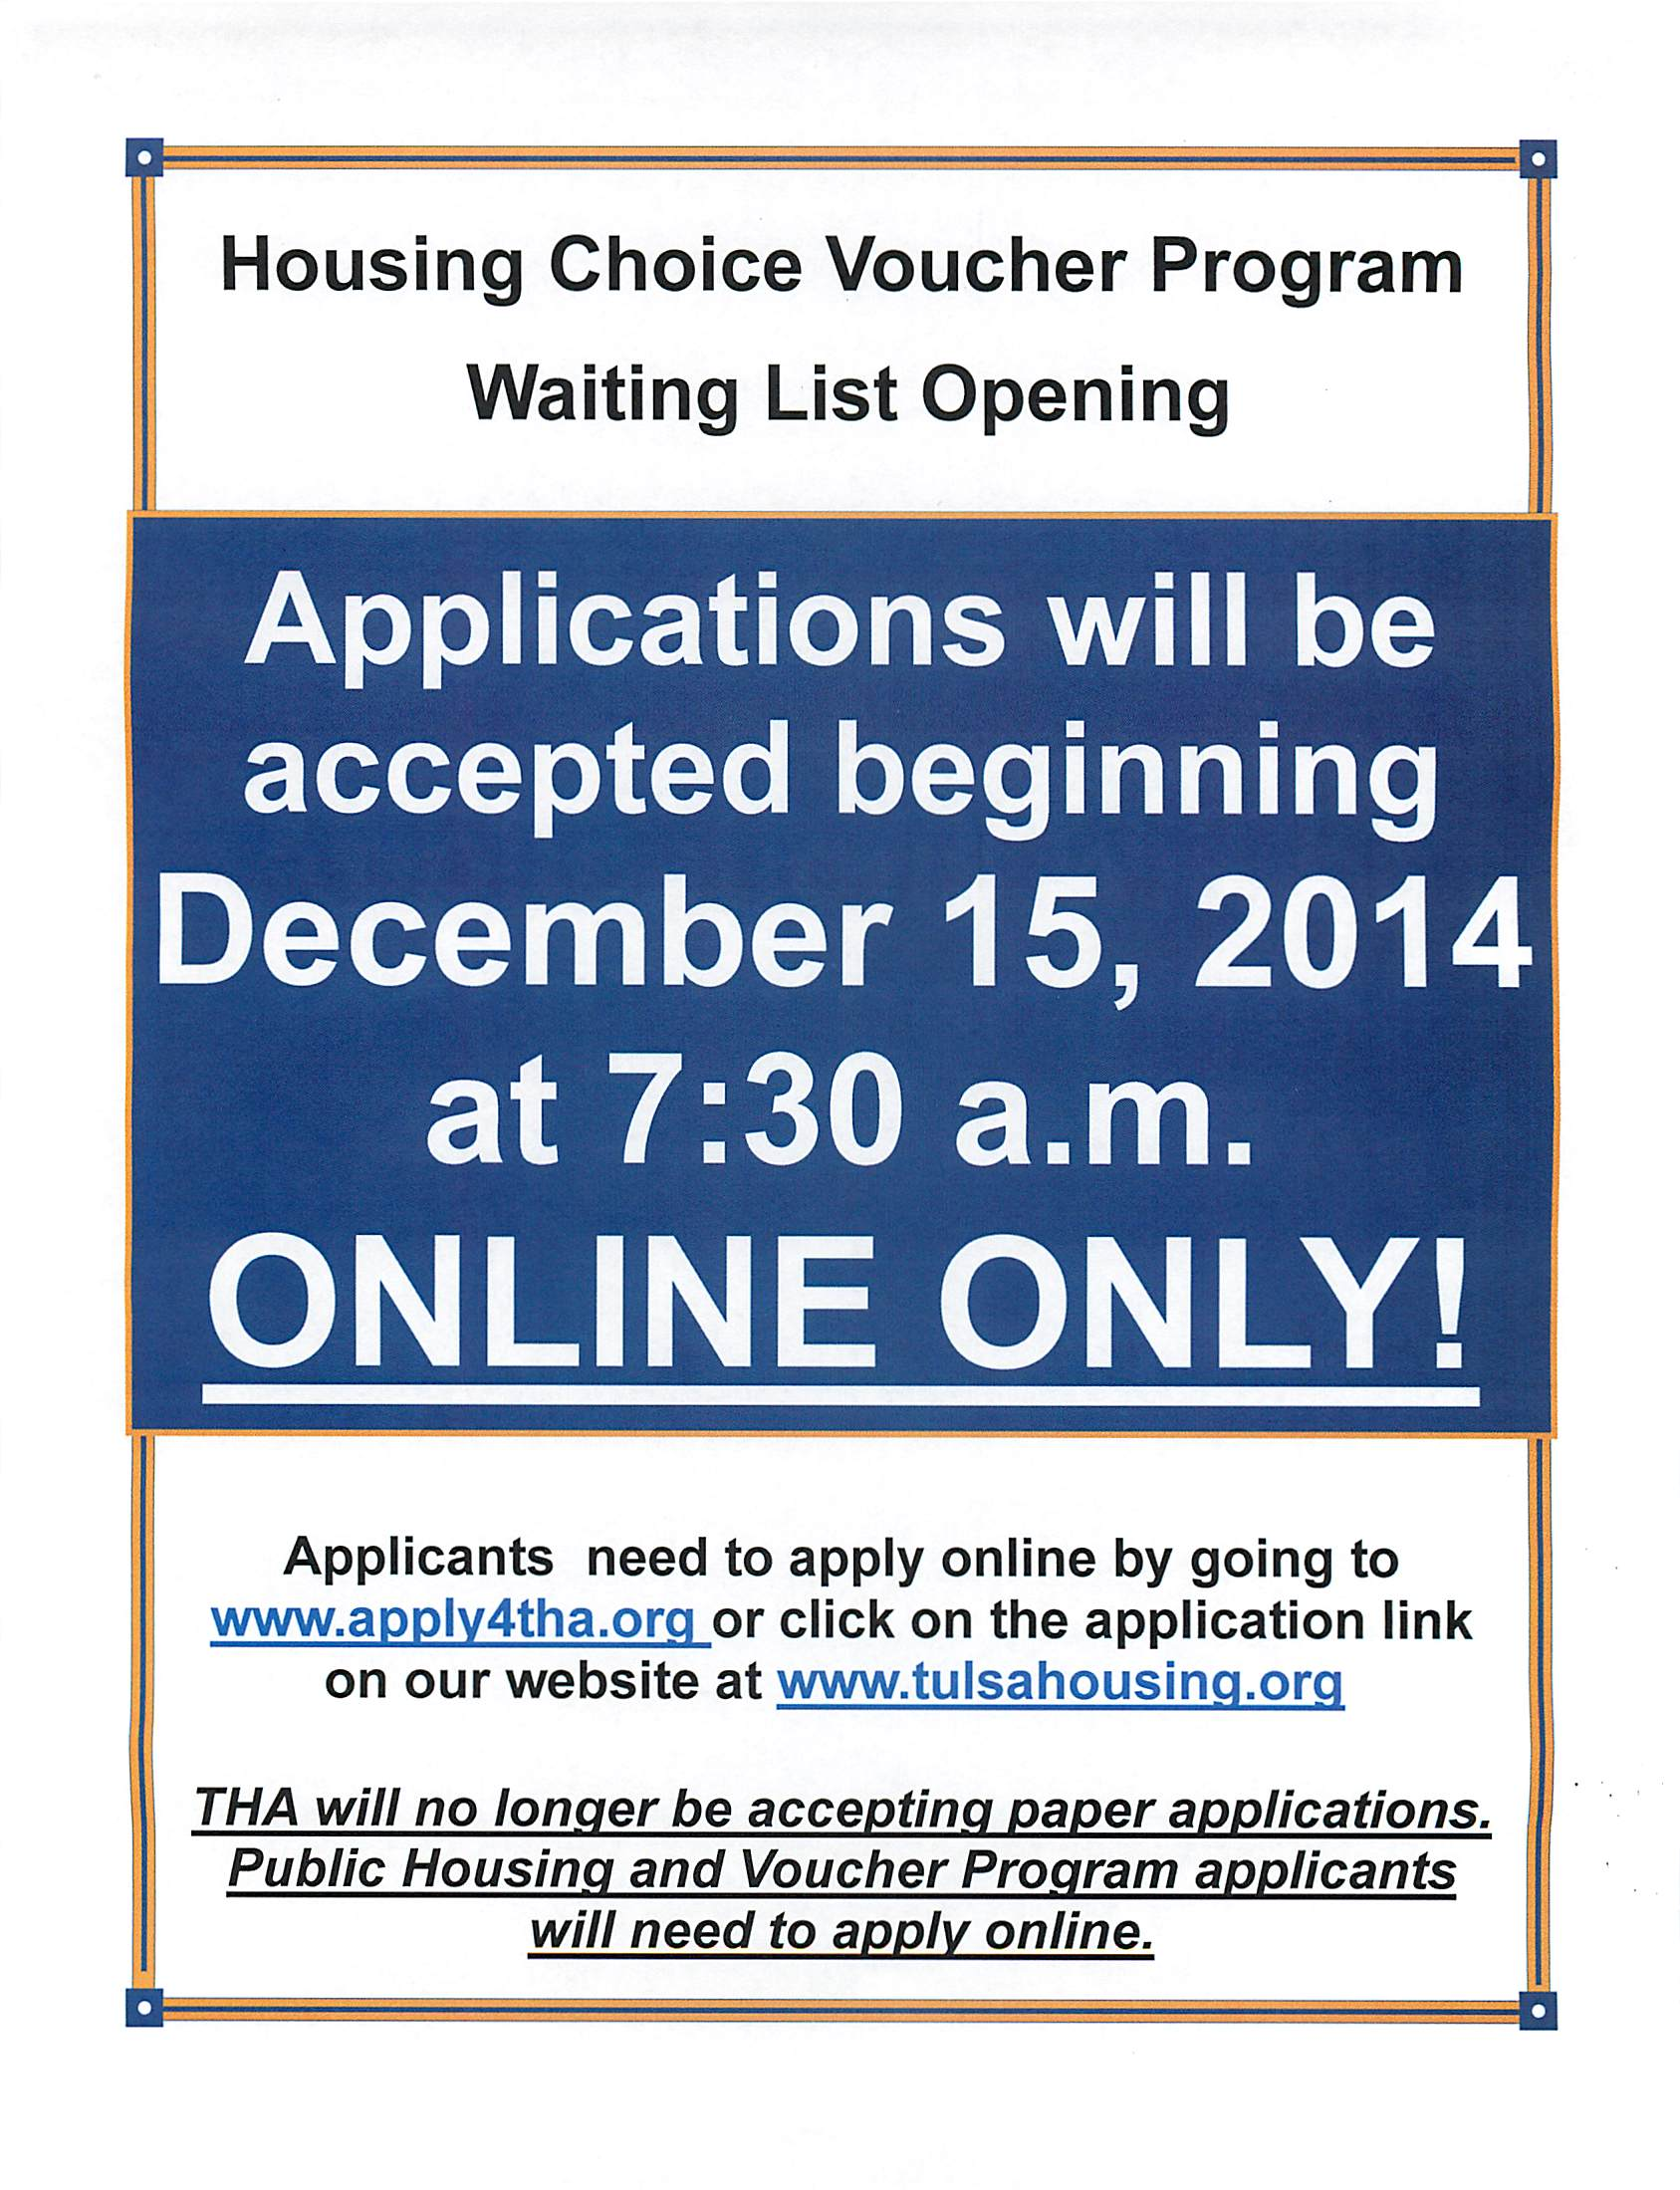 Tulsa Housing Authority – Voucher Program Open | News You Can Use!